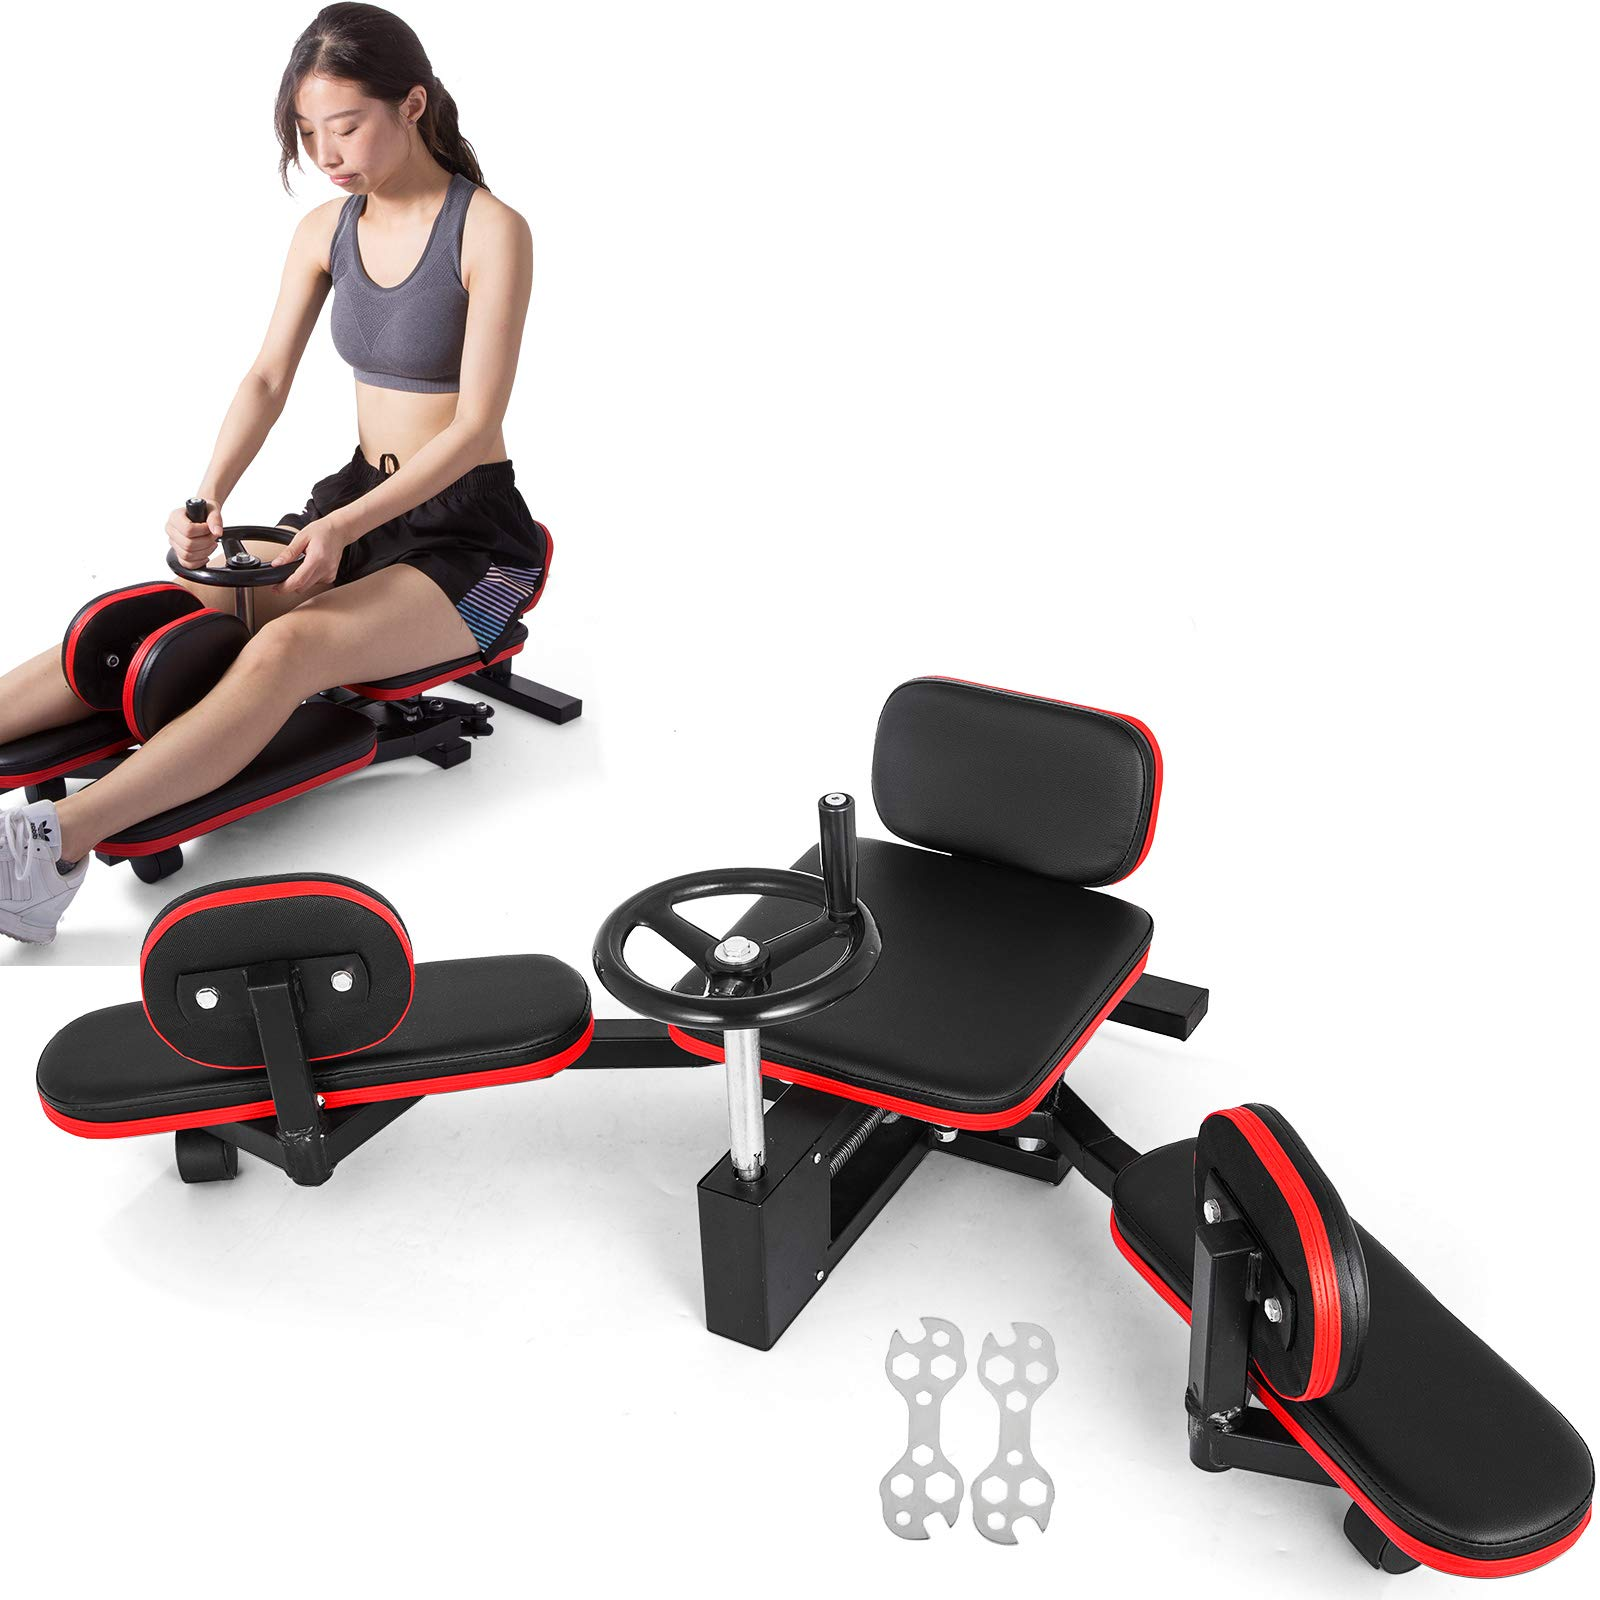 Leg Stretcher Stretching Training Machine Equipment Martial Arts Heavy Duty Calf